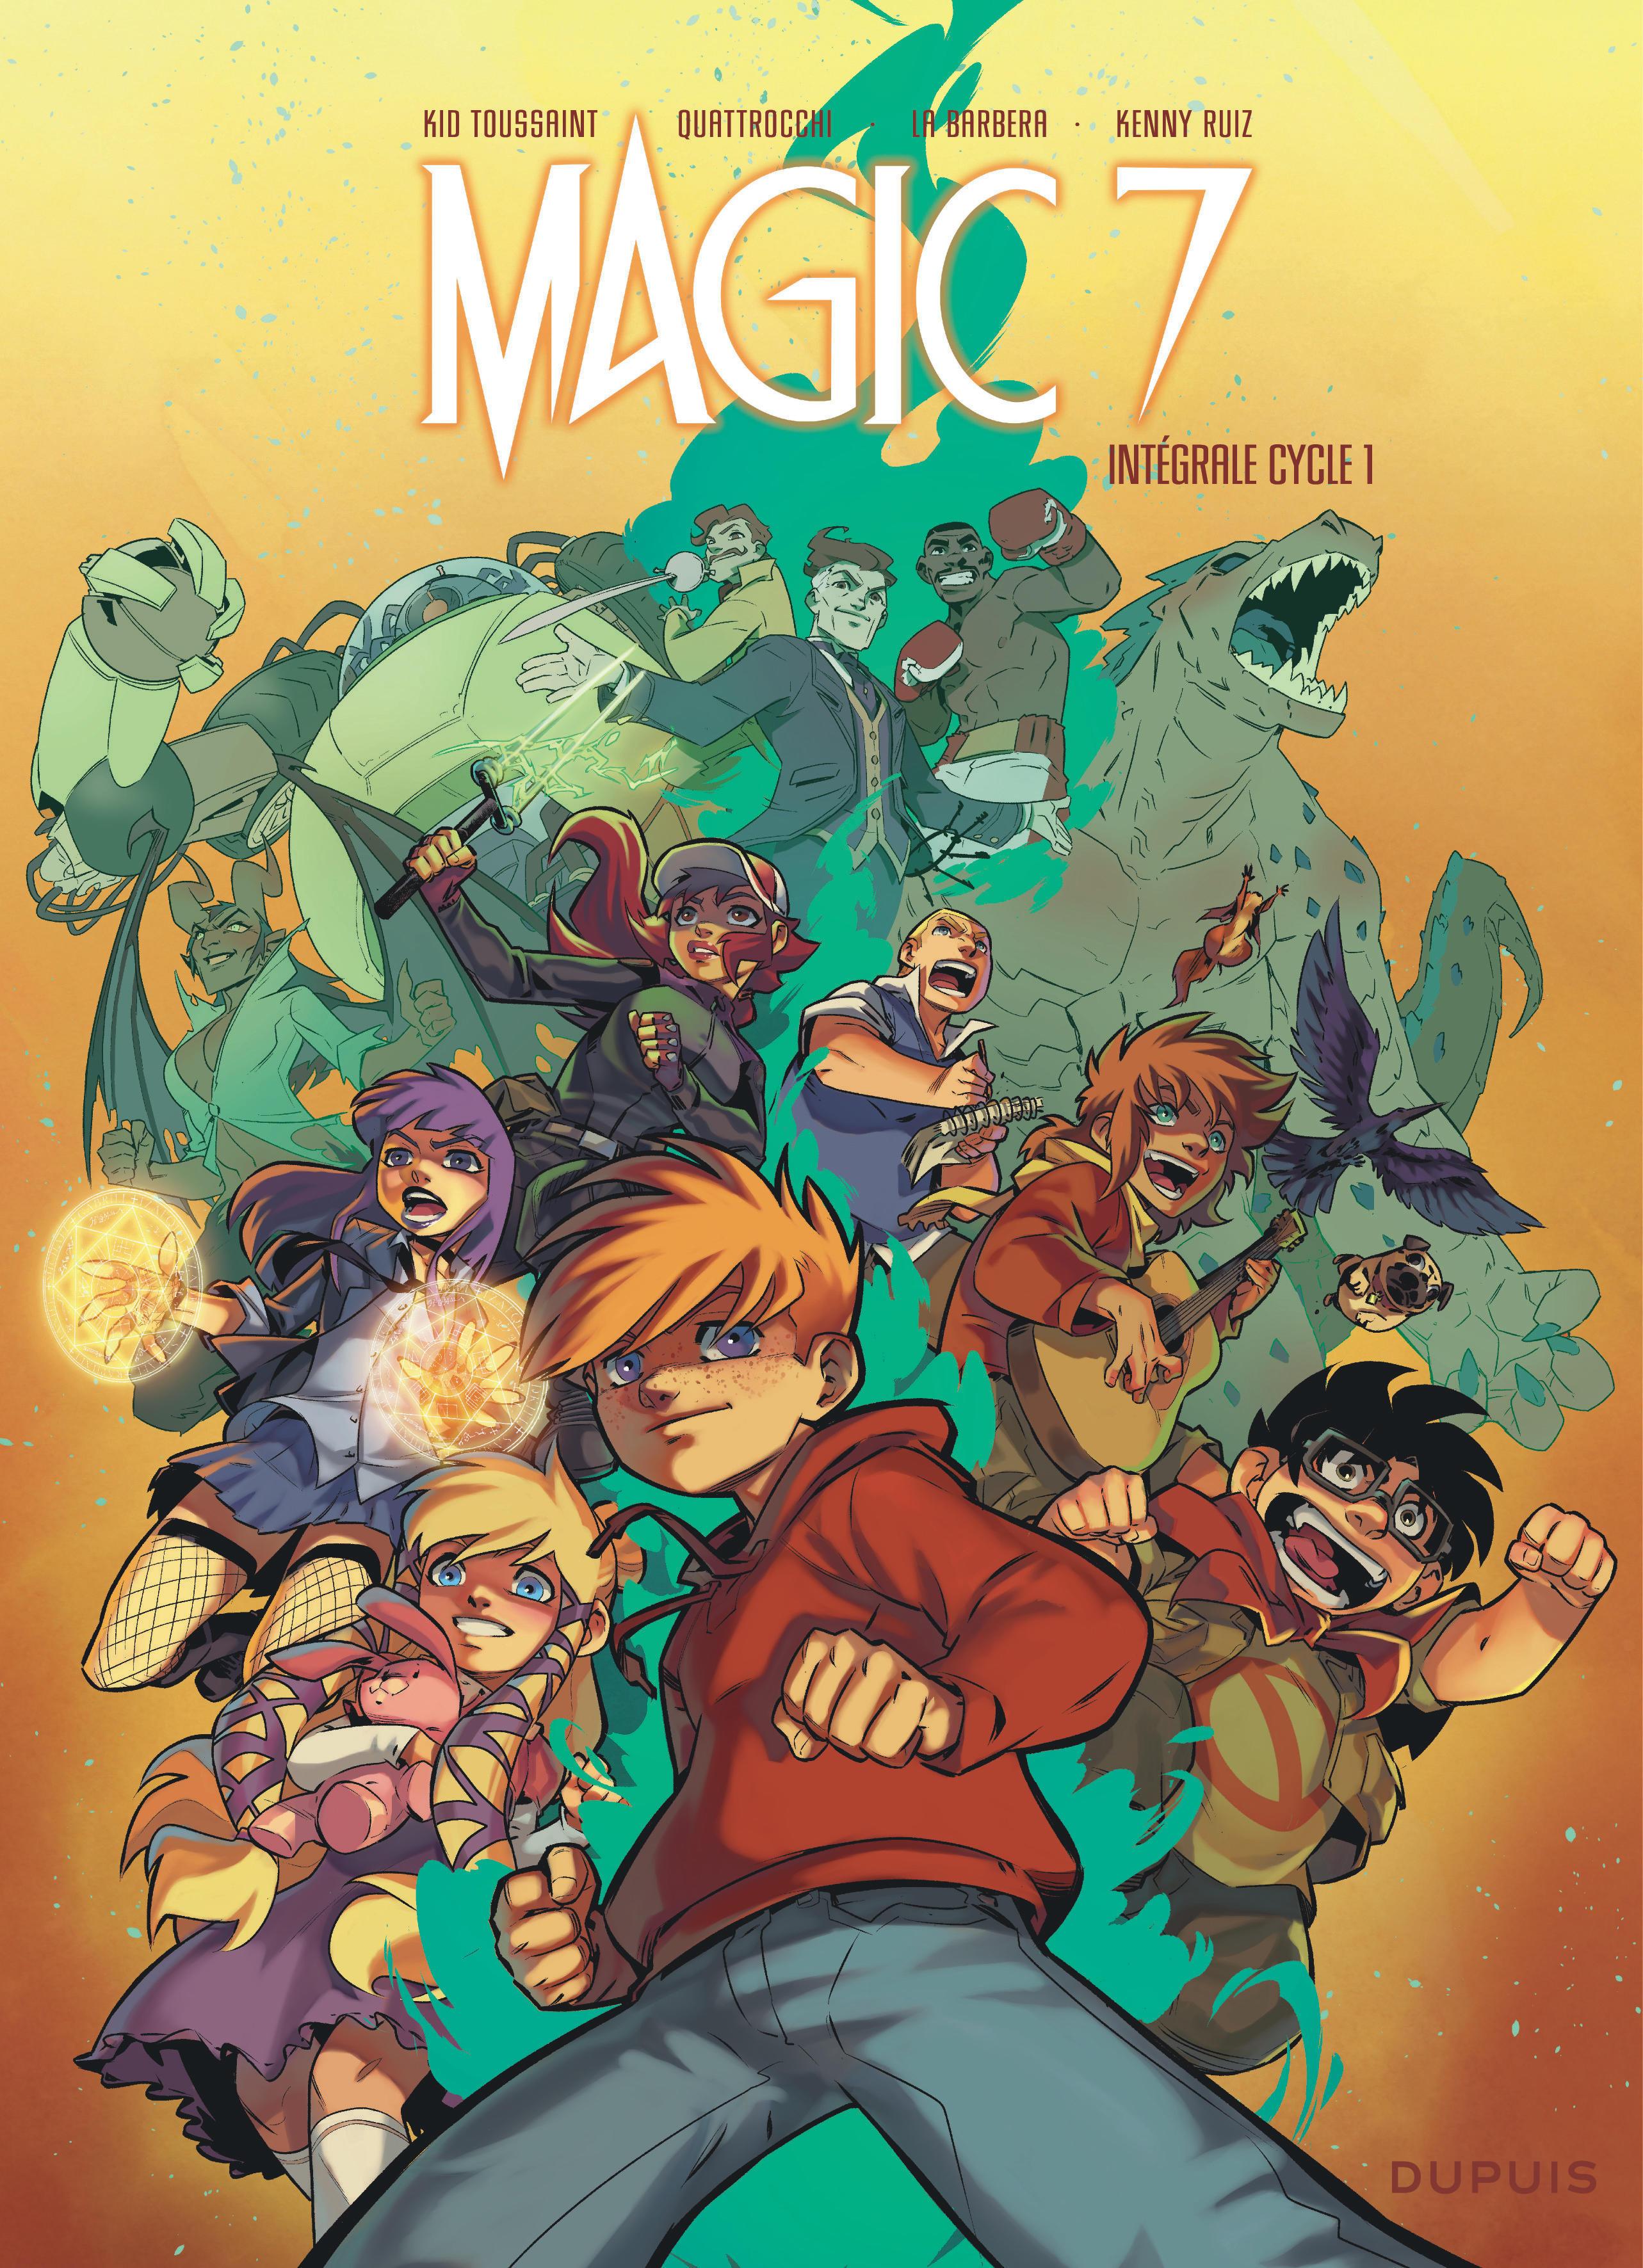 MAGIC 7 ? L'INTEGRALE  - TOME 1 - MAGIC 7 INTEGRALE DU CYCLE 1 - MAGIC 7 - L'INTEGRALE